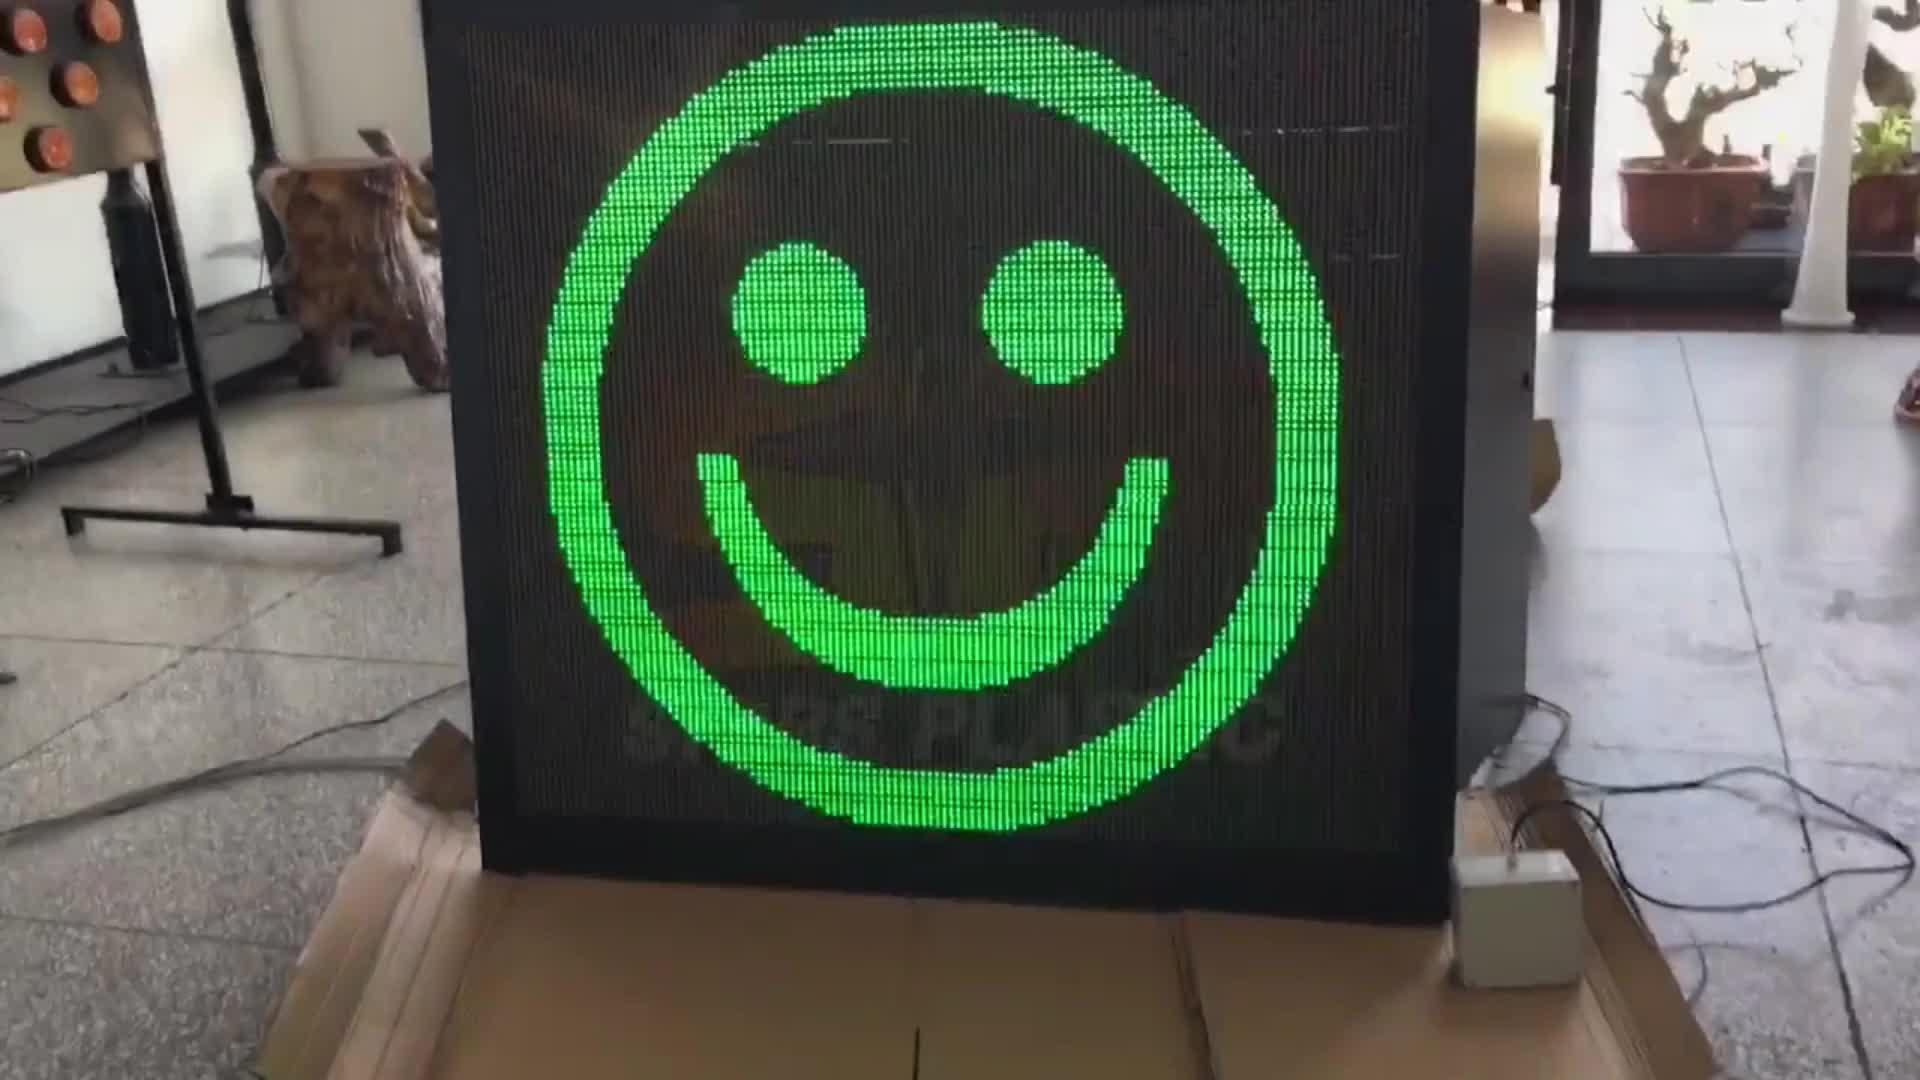 Emoj 顔車スイングソーラー Led レーダー速度看板計中国速度制御制限削除検出器ディスプレイ絵文字顔速度レーダー